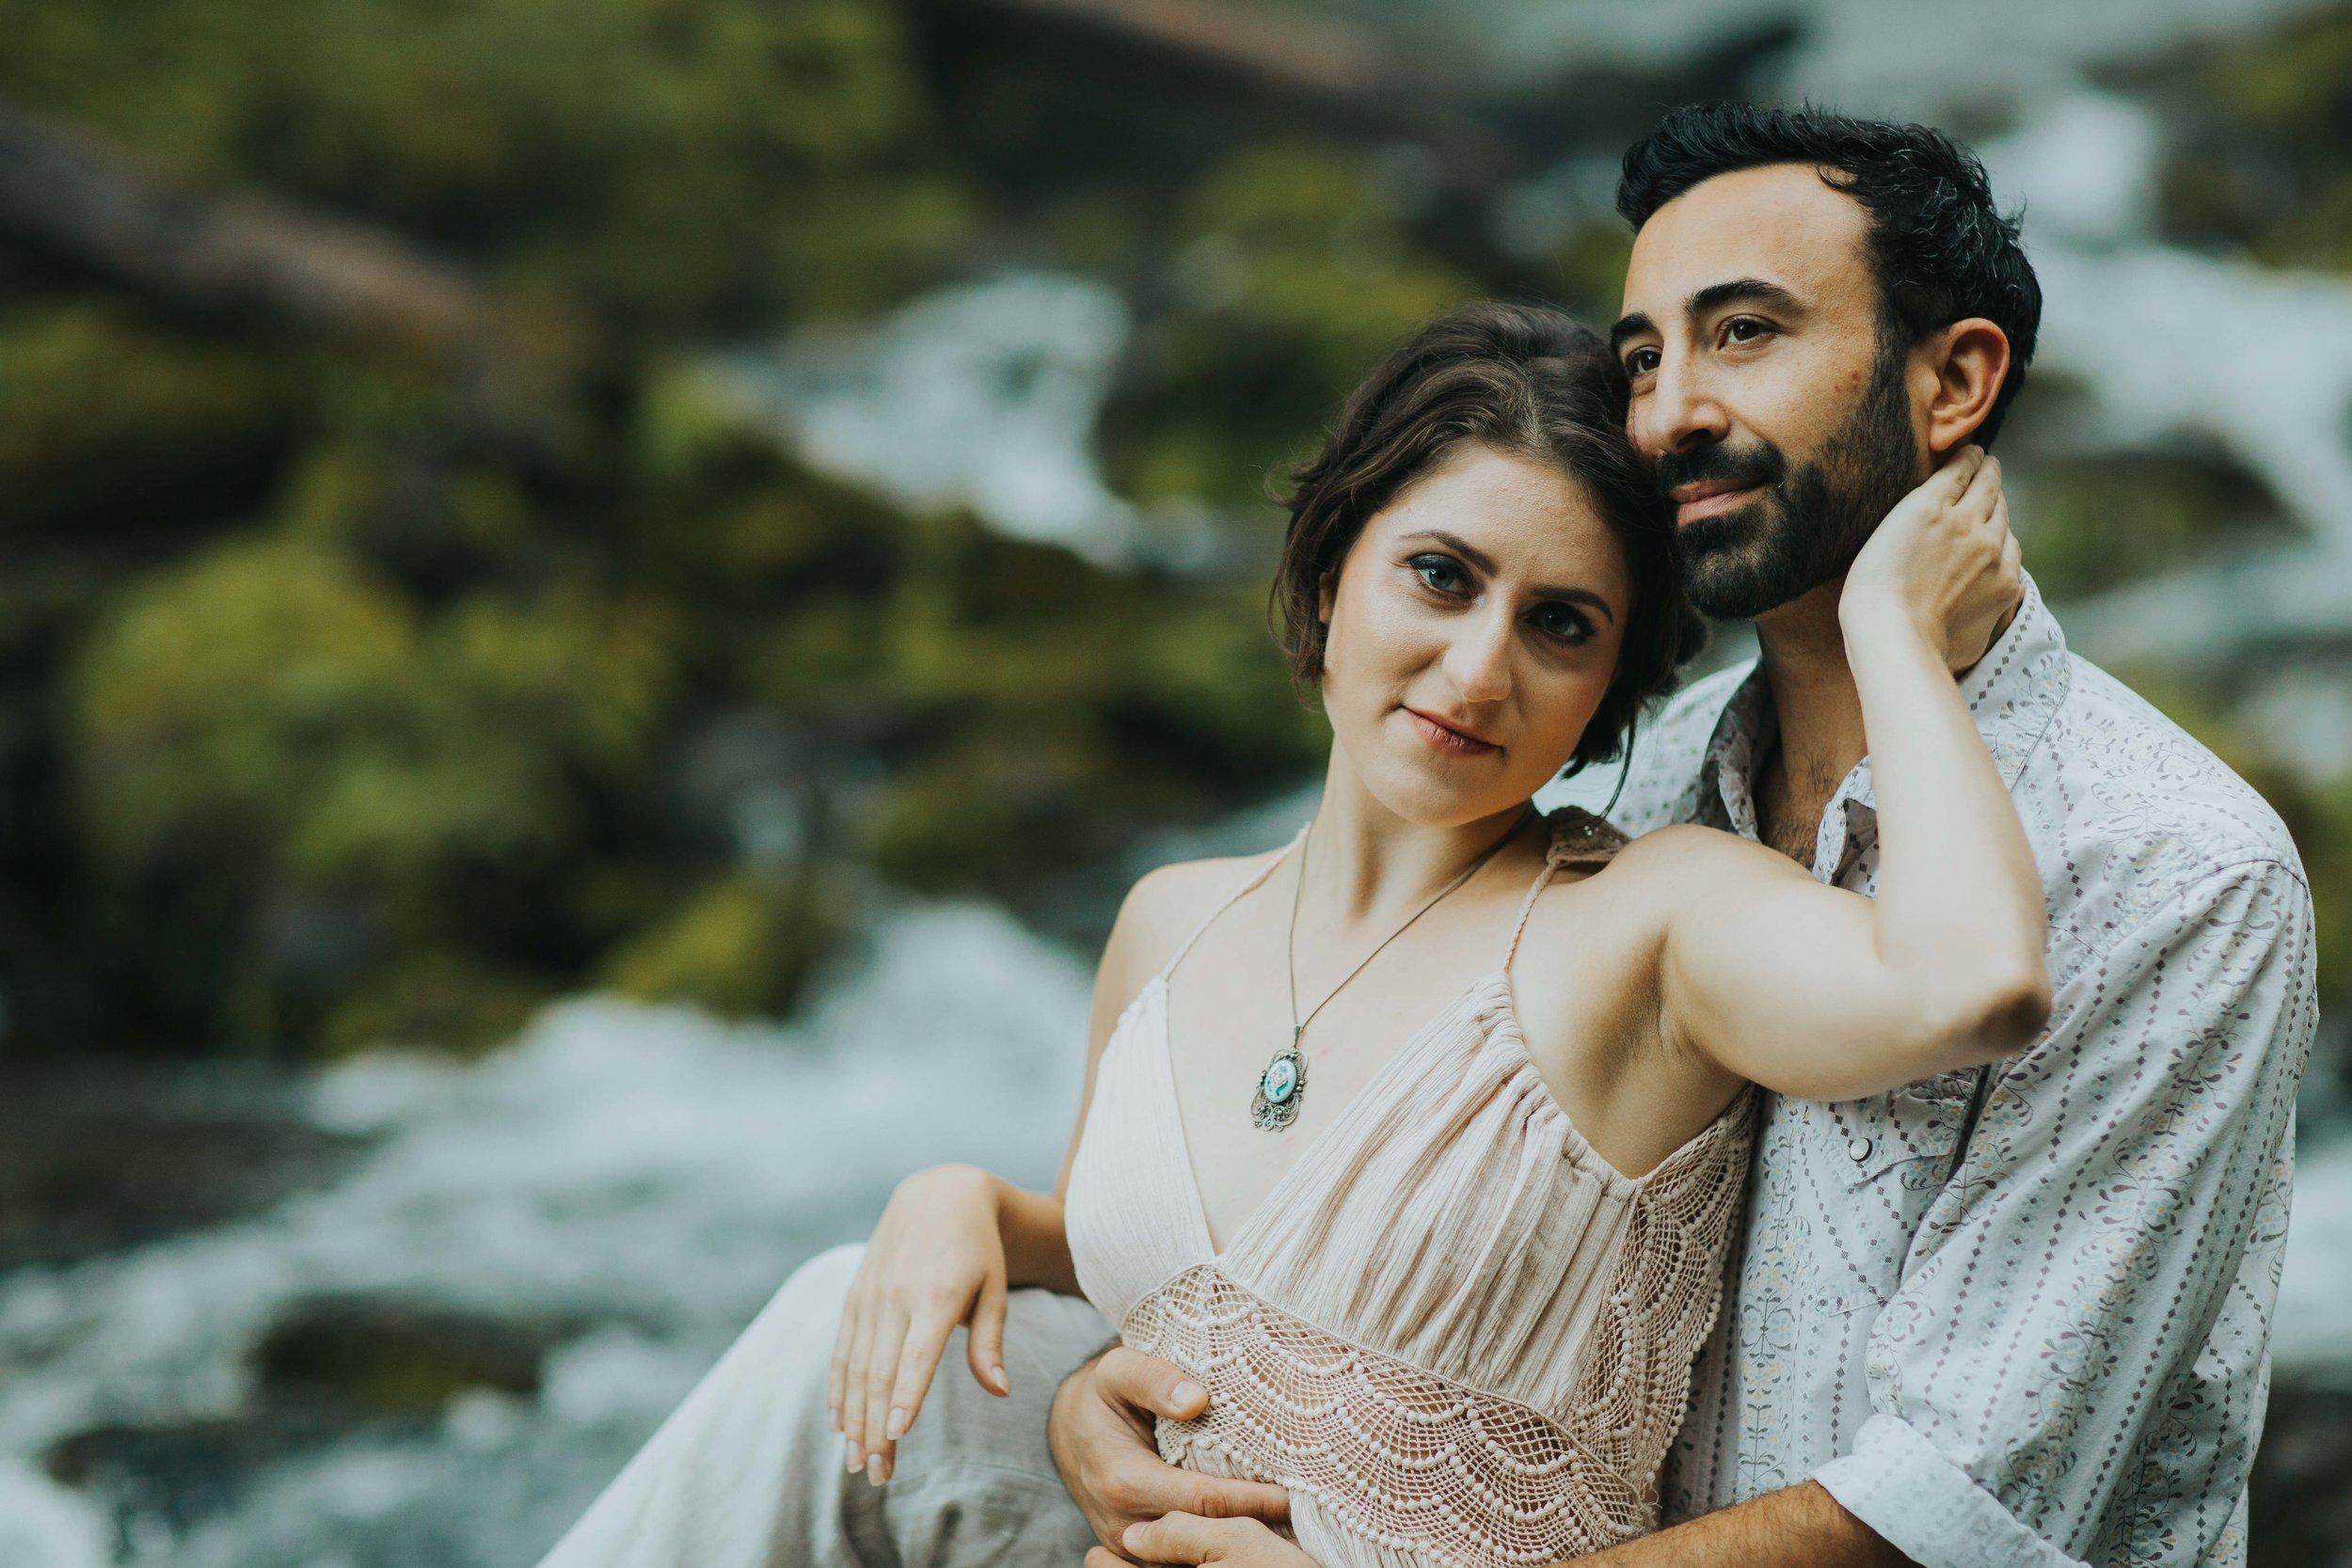 Portland Elopement Adventure Wedding Photographer-9.jpg